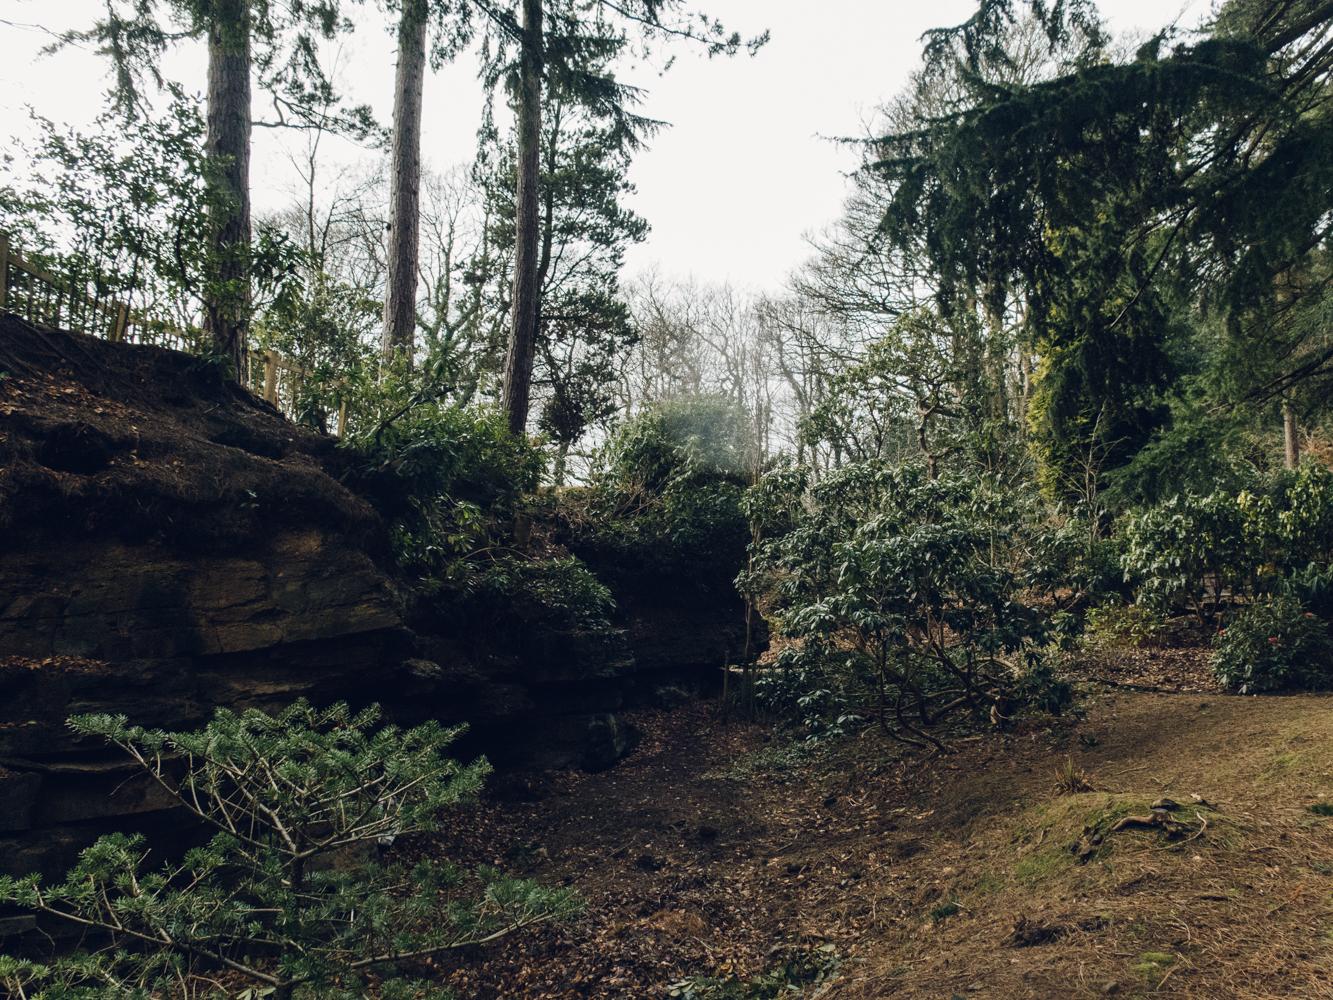 Haarkon Whinfell Quarry Gardens Sheffield Plants Greenery Park Yorkshire Leaf Redwood